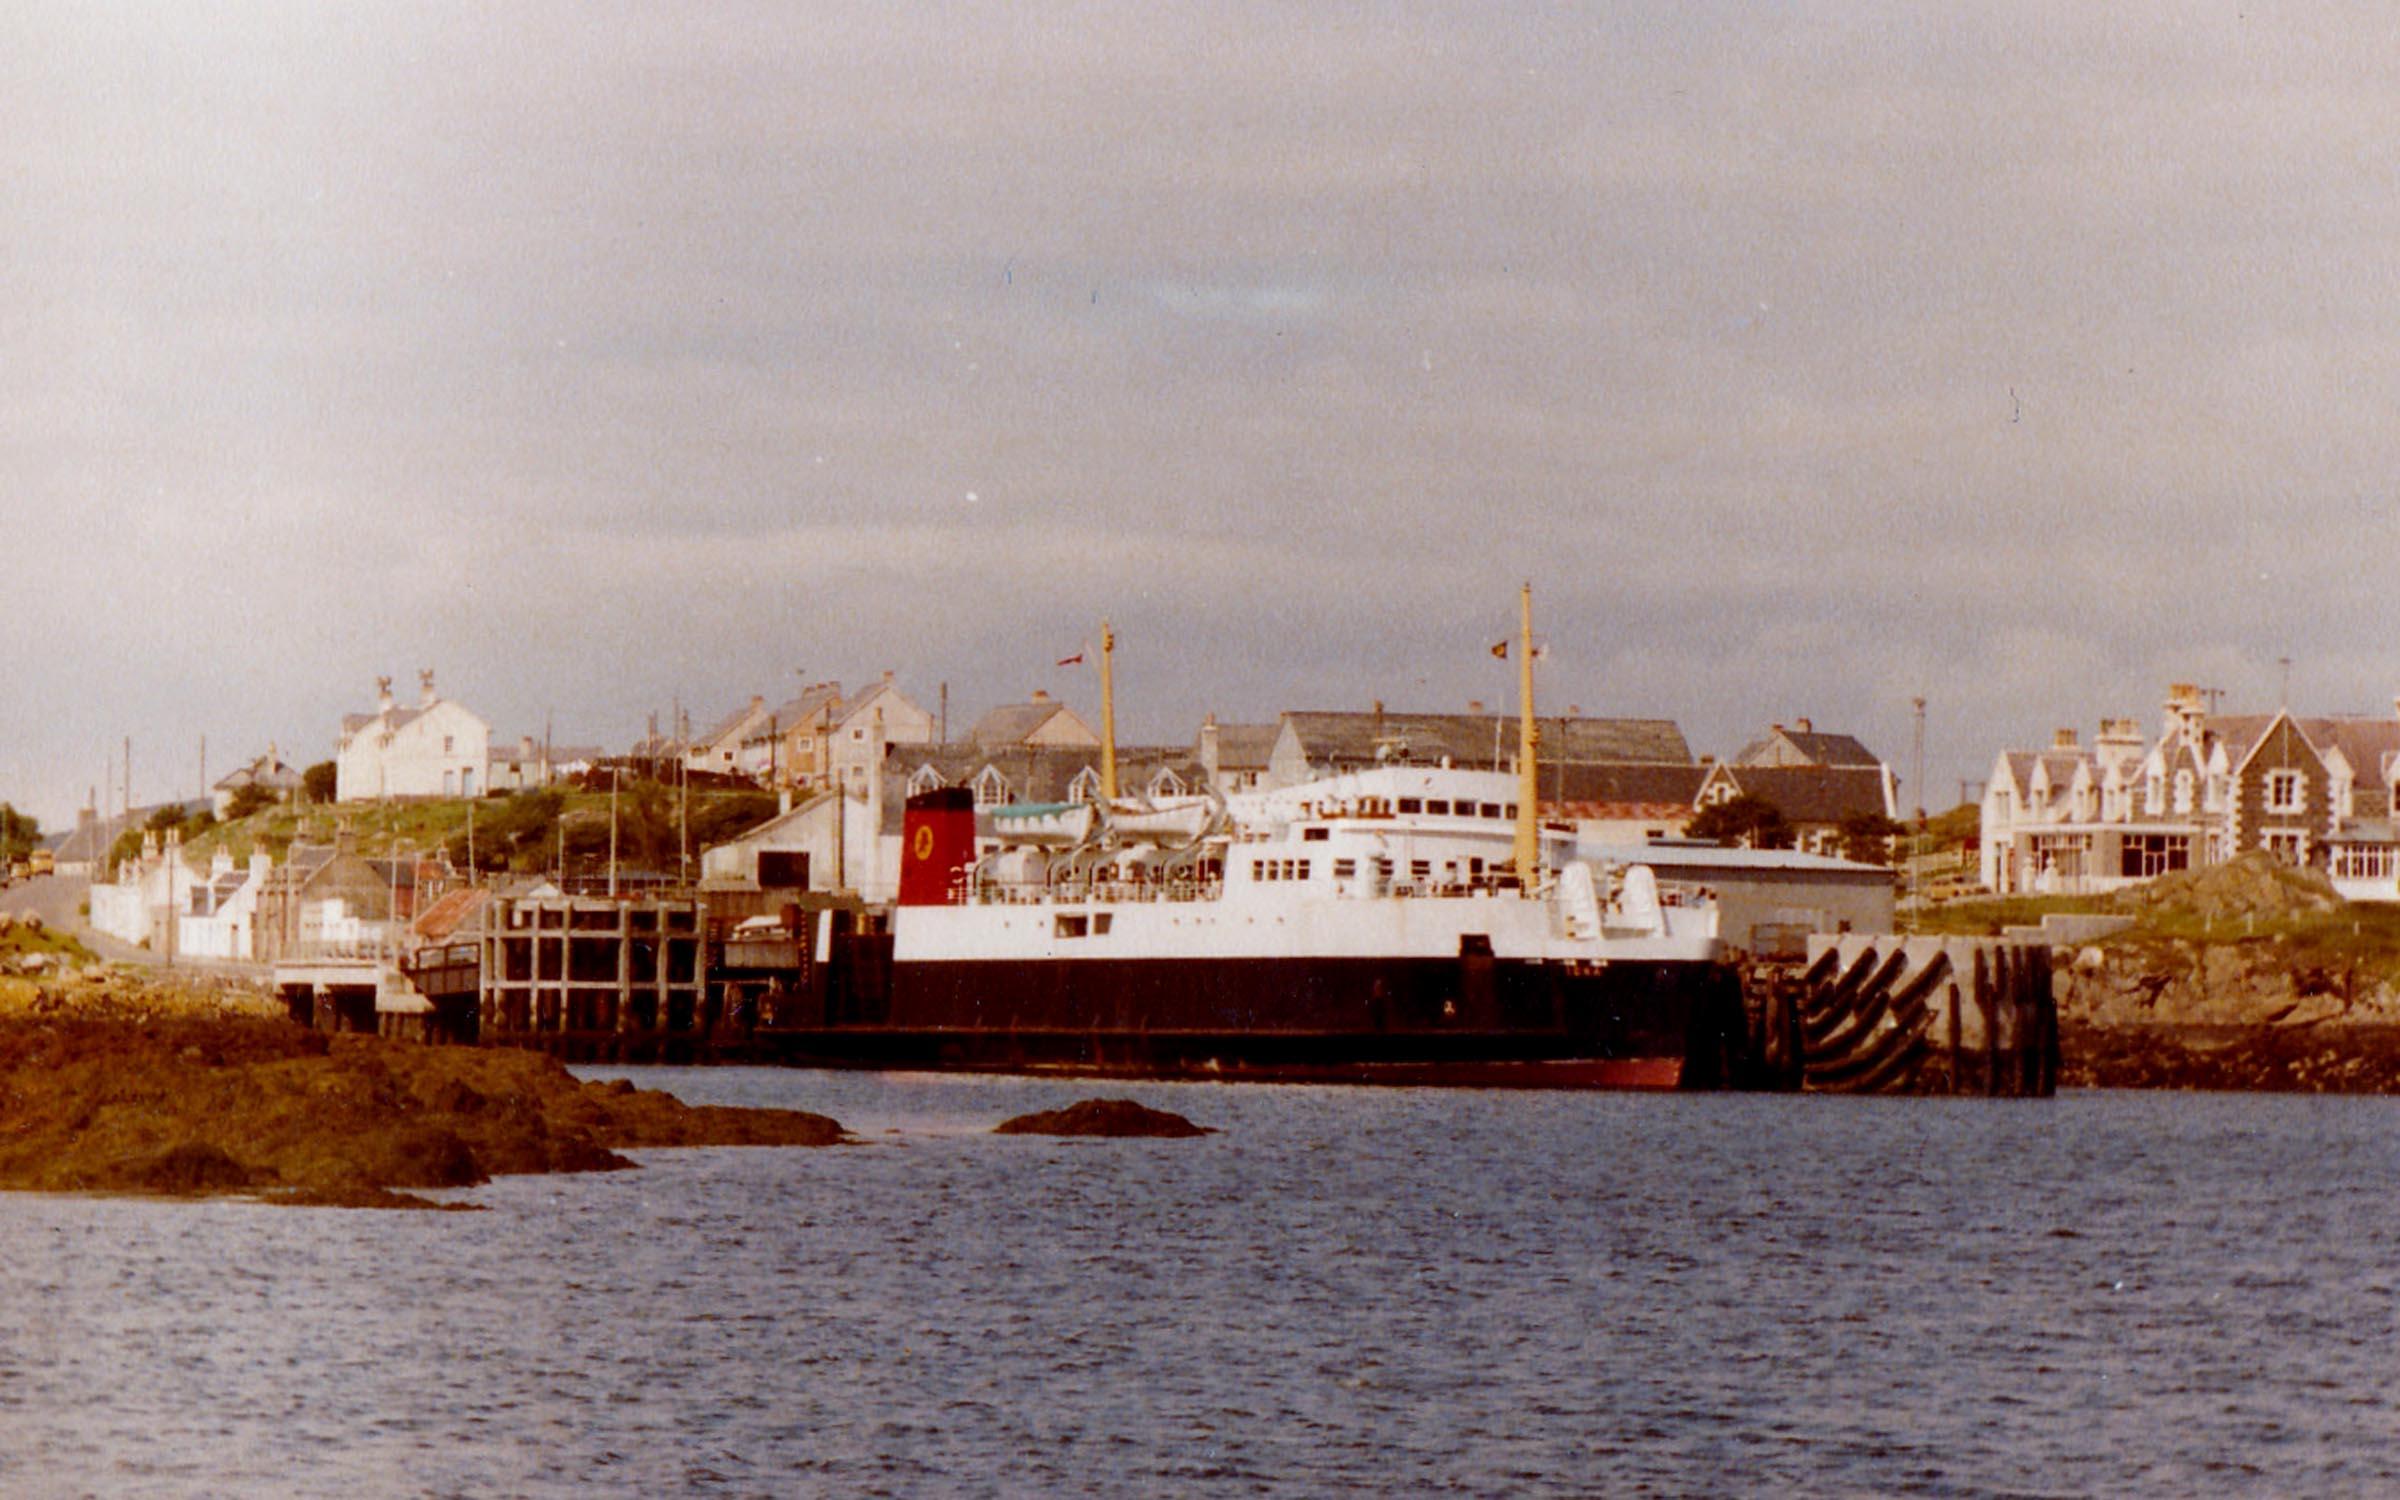 Iona at Lochboisdale (Jim AIkman Smith)